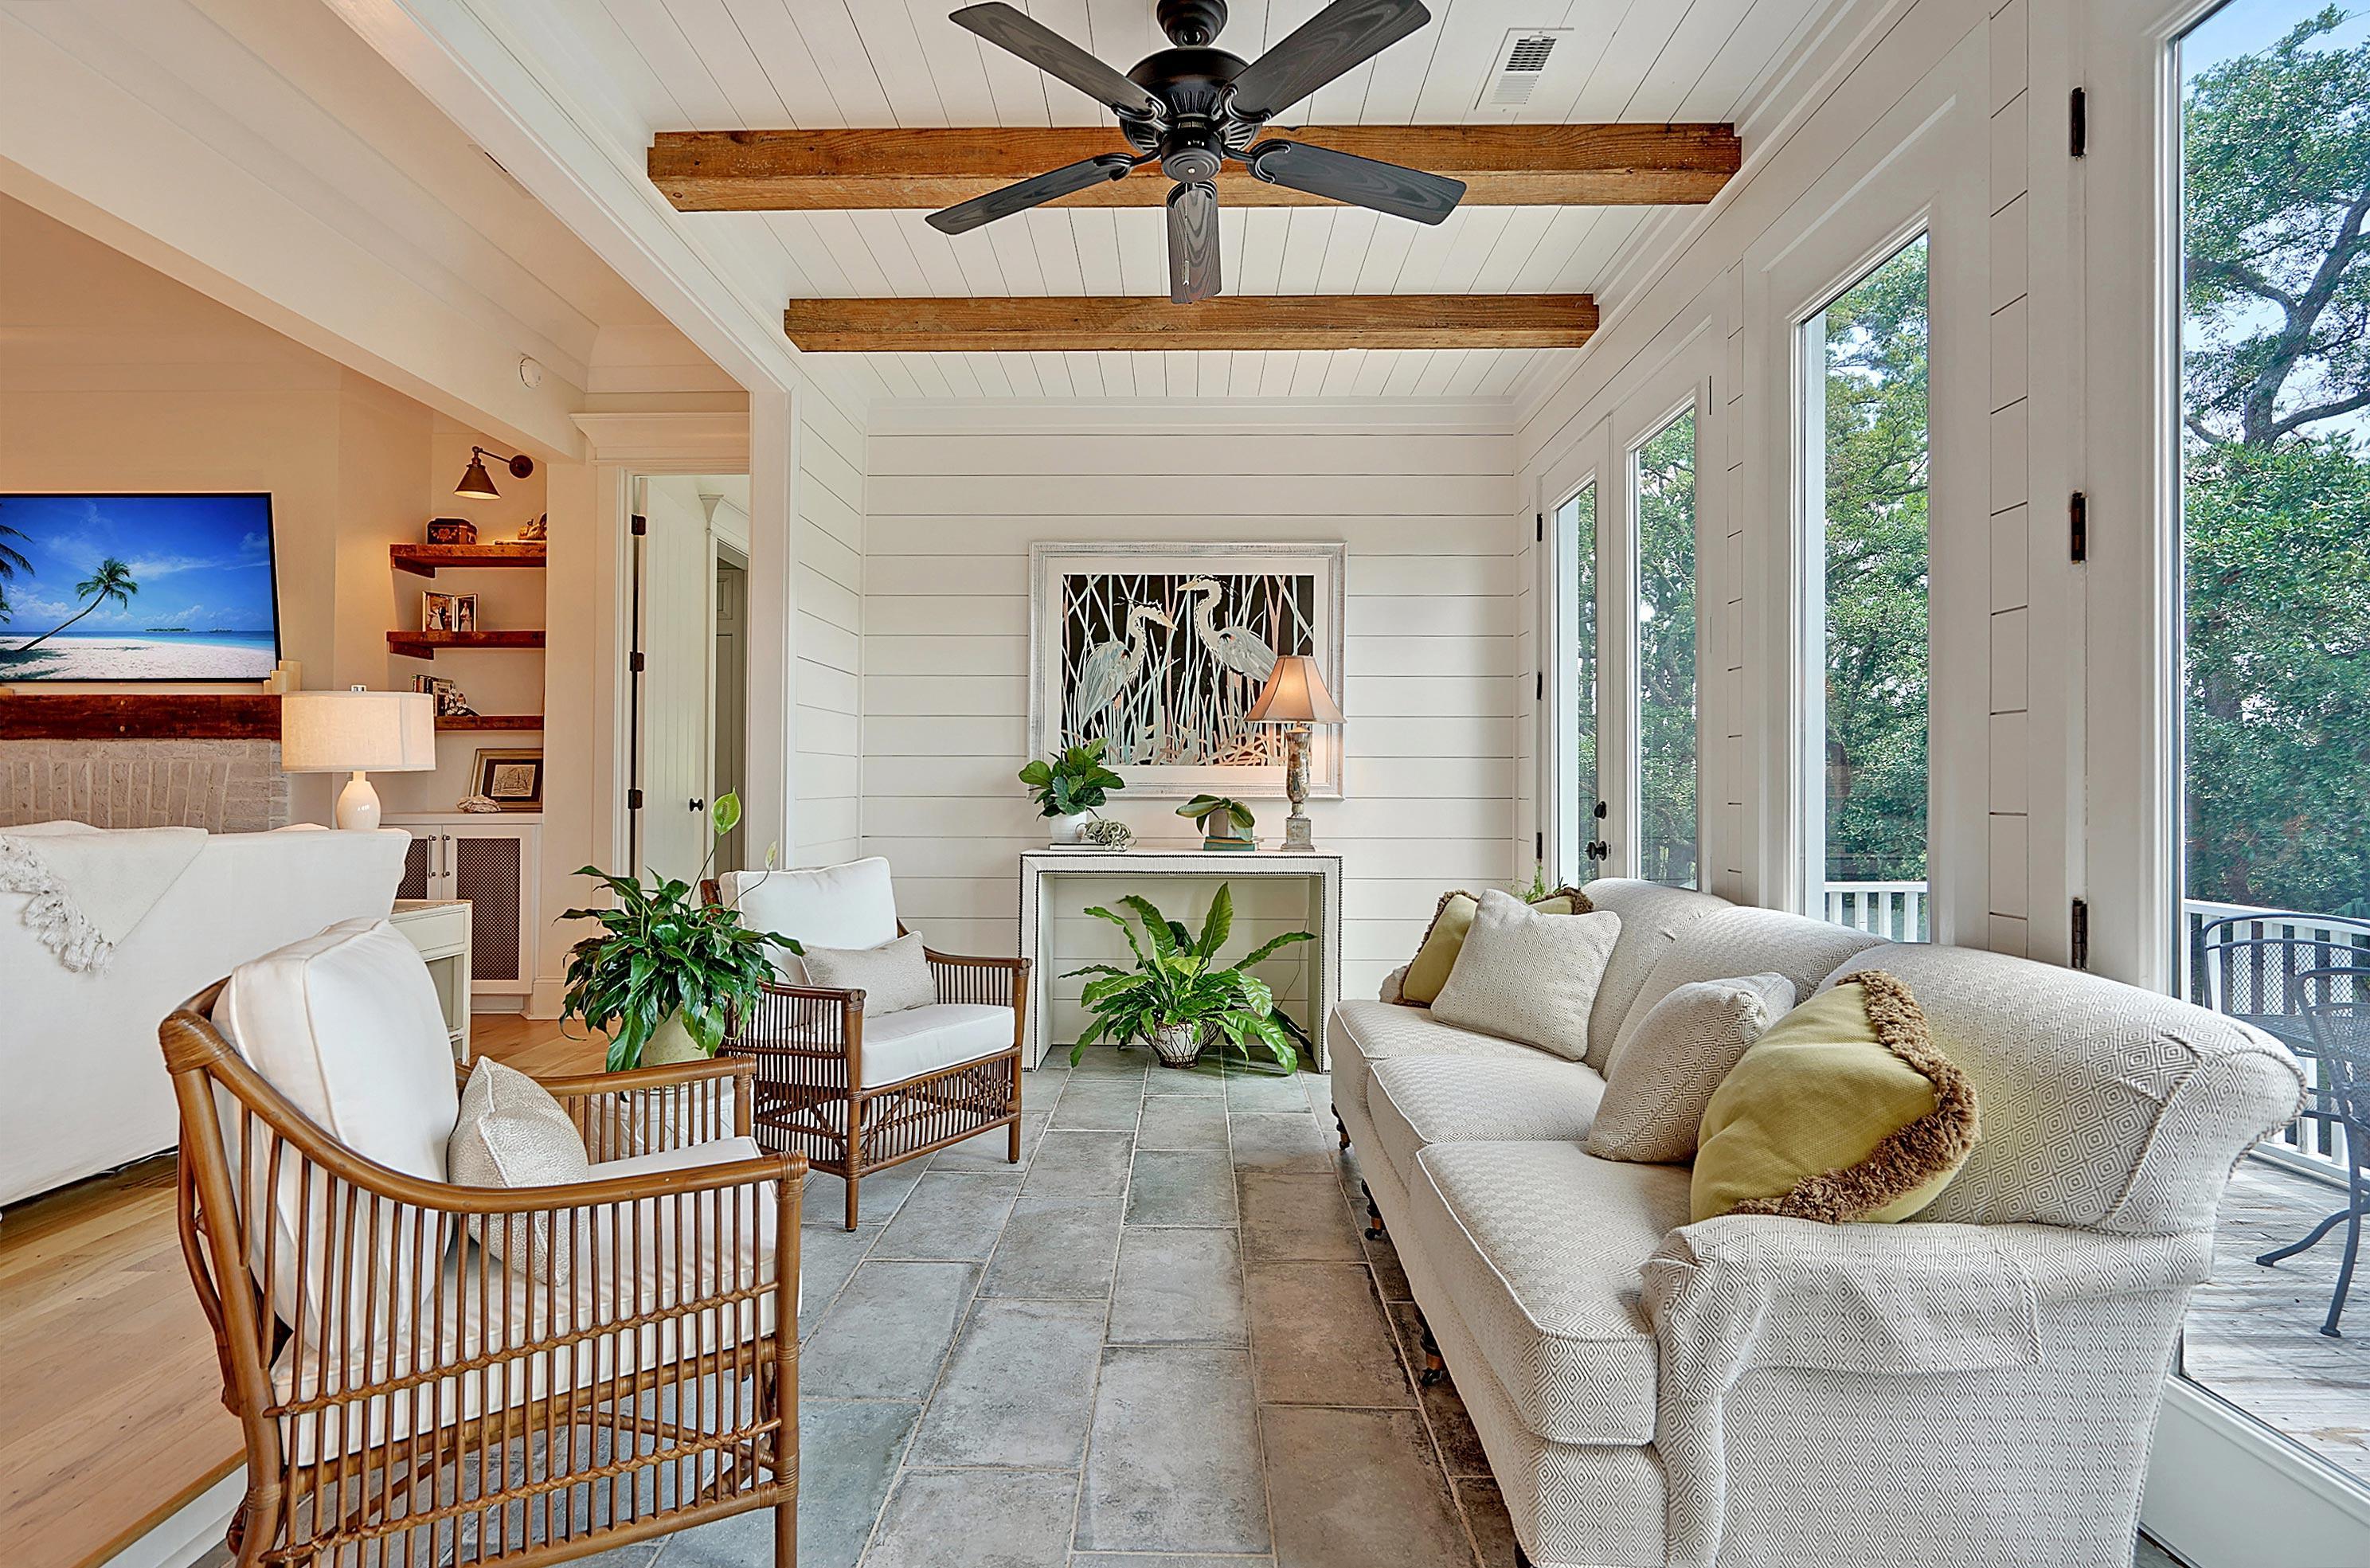 Grassy Creek Homes For Sale - 294 River Oak, Mount Pleasant, SC - 45